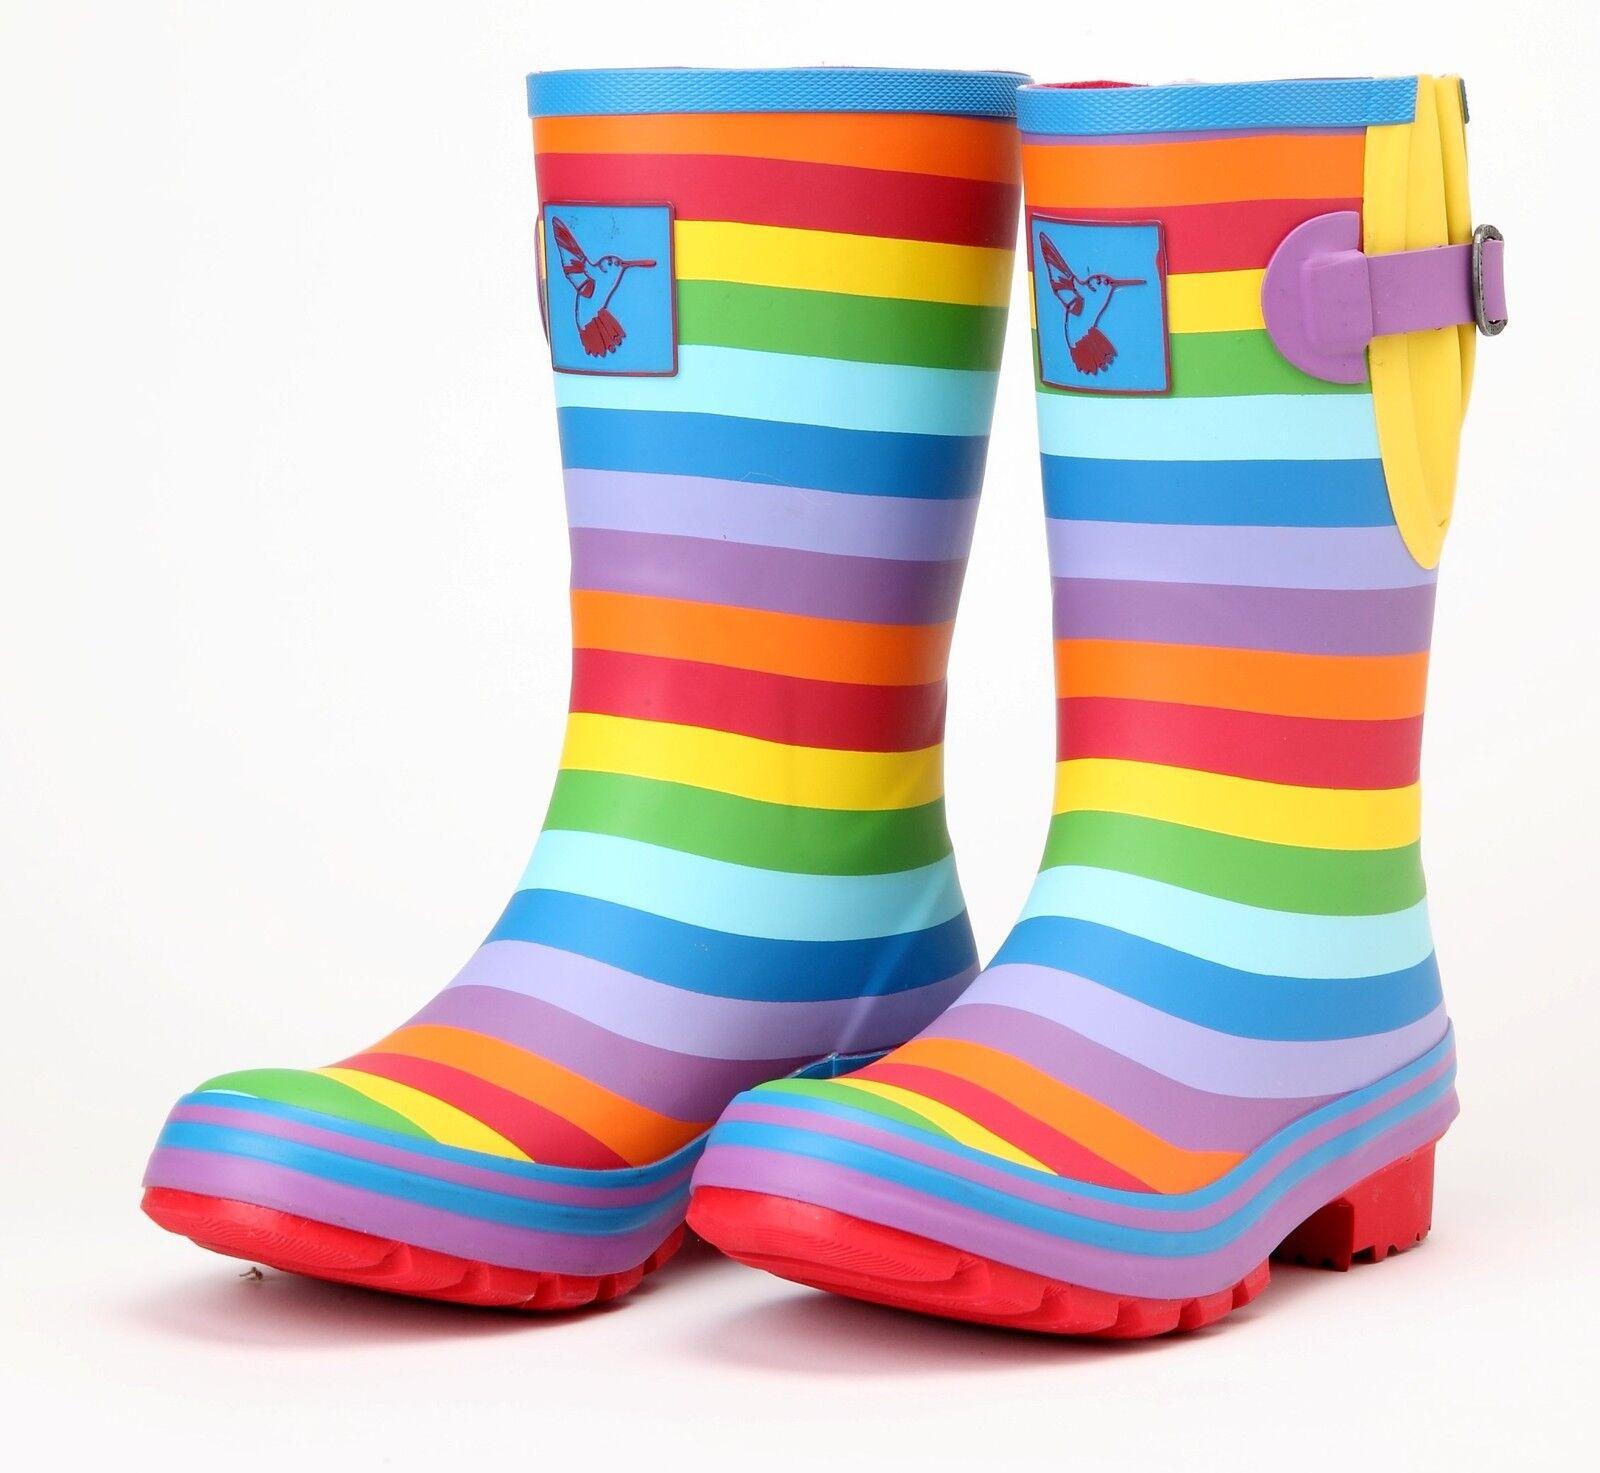 Ladies Evercreatures Multi Patterned Short Wellies Wellington Boots - UK 3 - 8